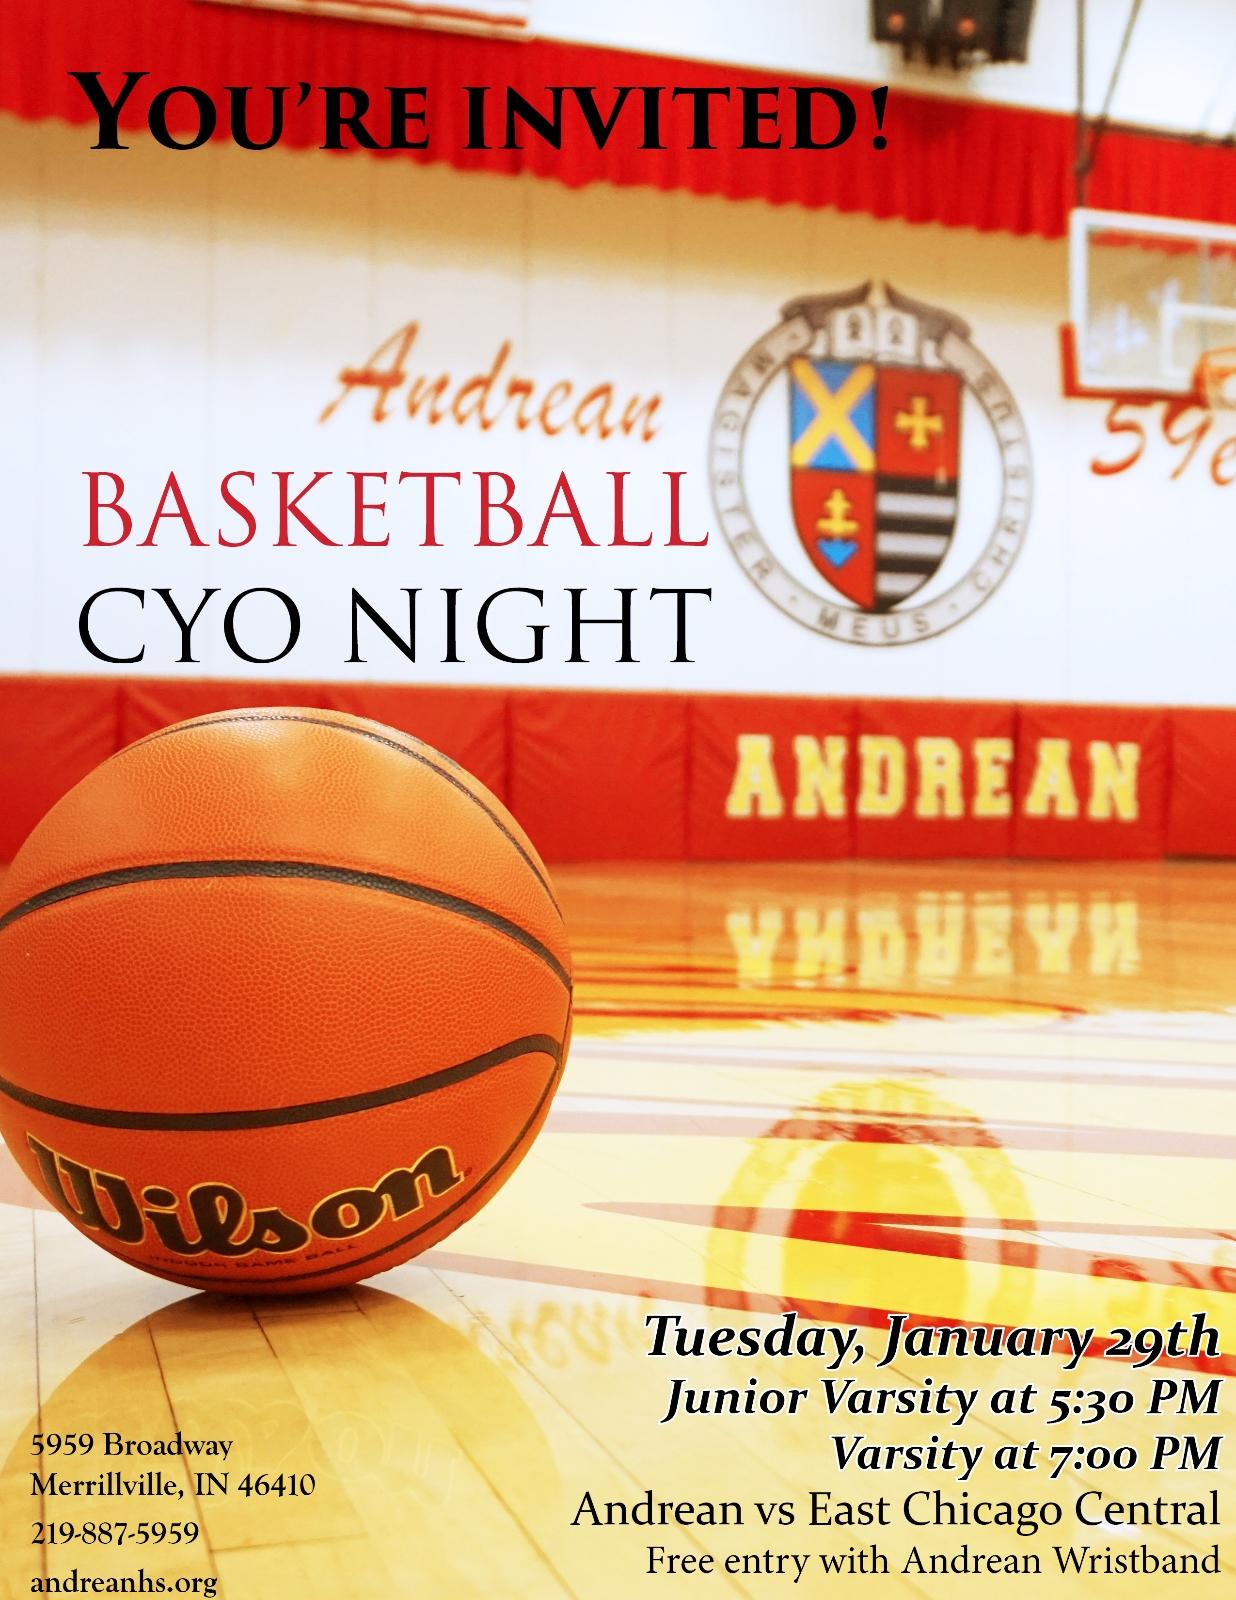 Boys Basketball to Host CYO Night Tuesday January 29th